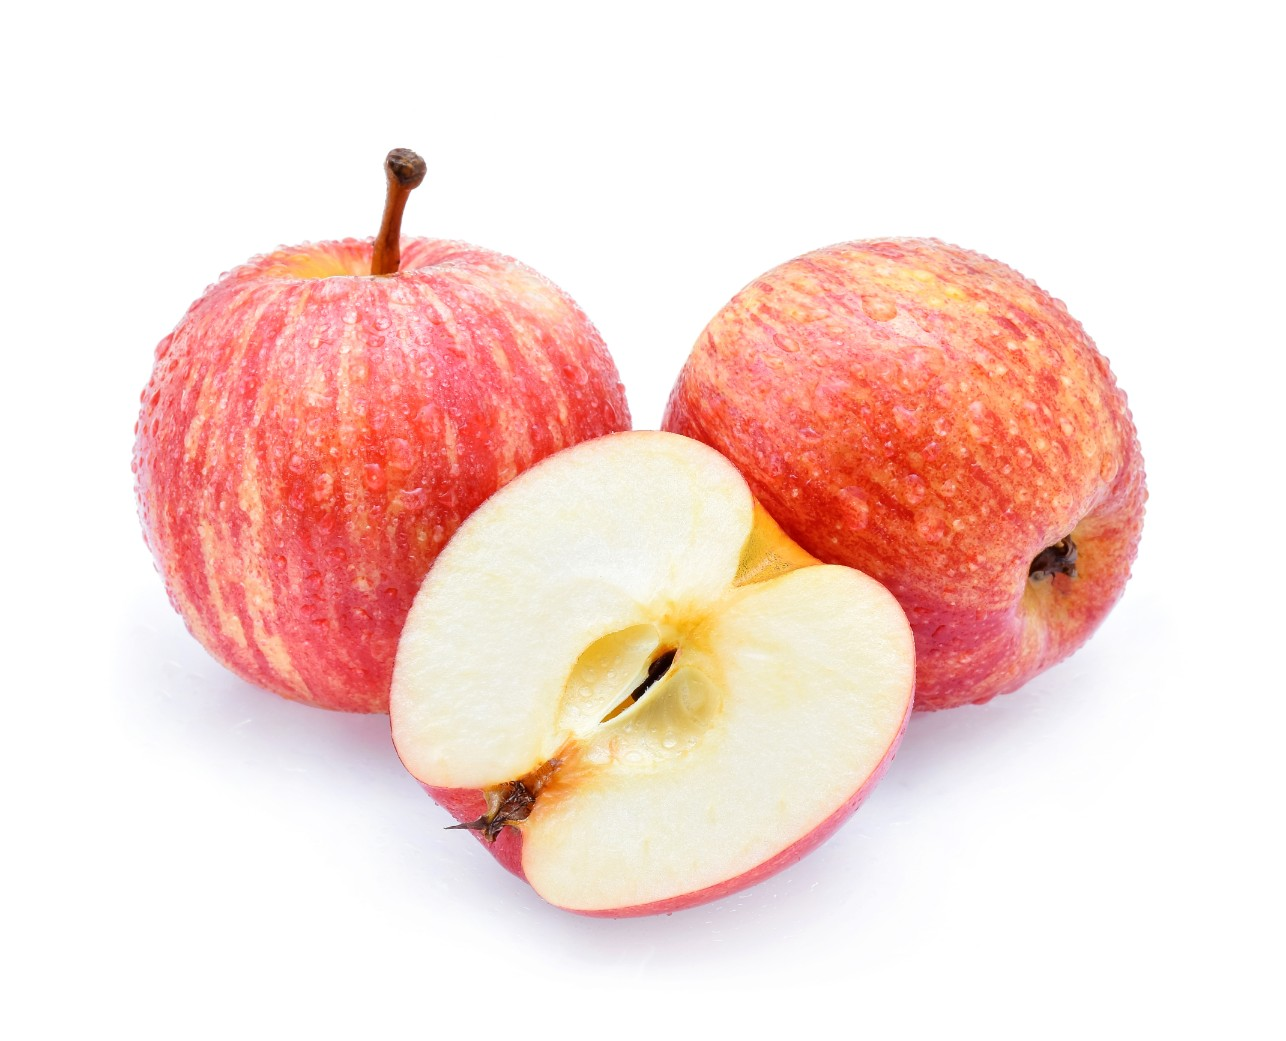 gala-apple-fruit